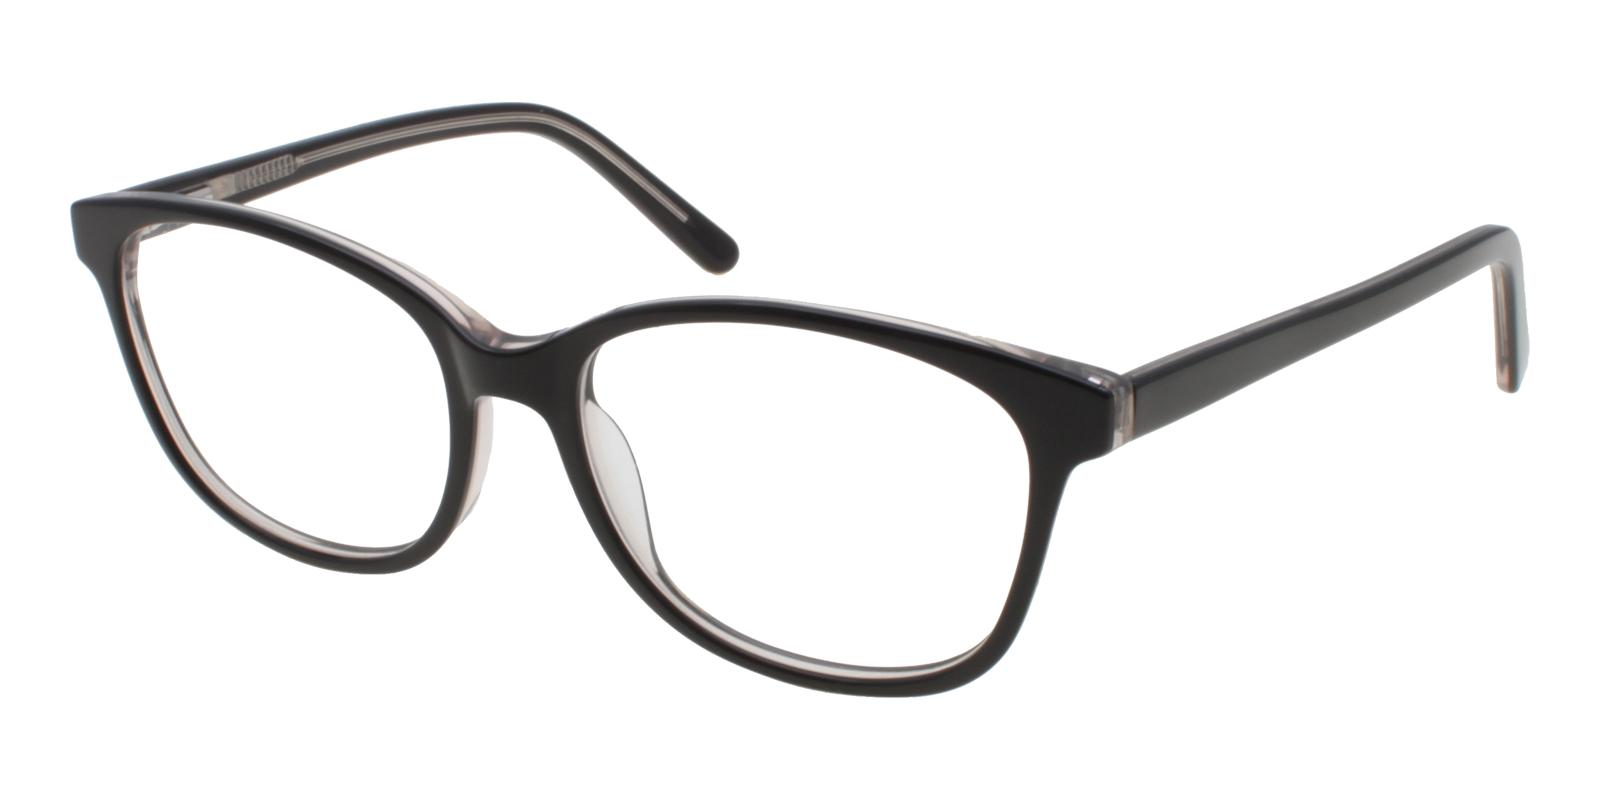 Bolivia Black Acetate Eyeglasses , SpringHinges , UniversalBridgeFit Frames from ABBE Glasses